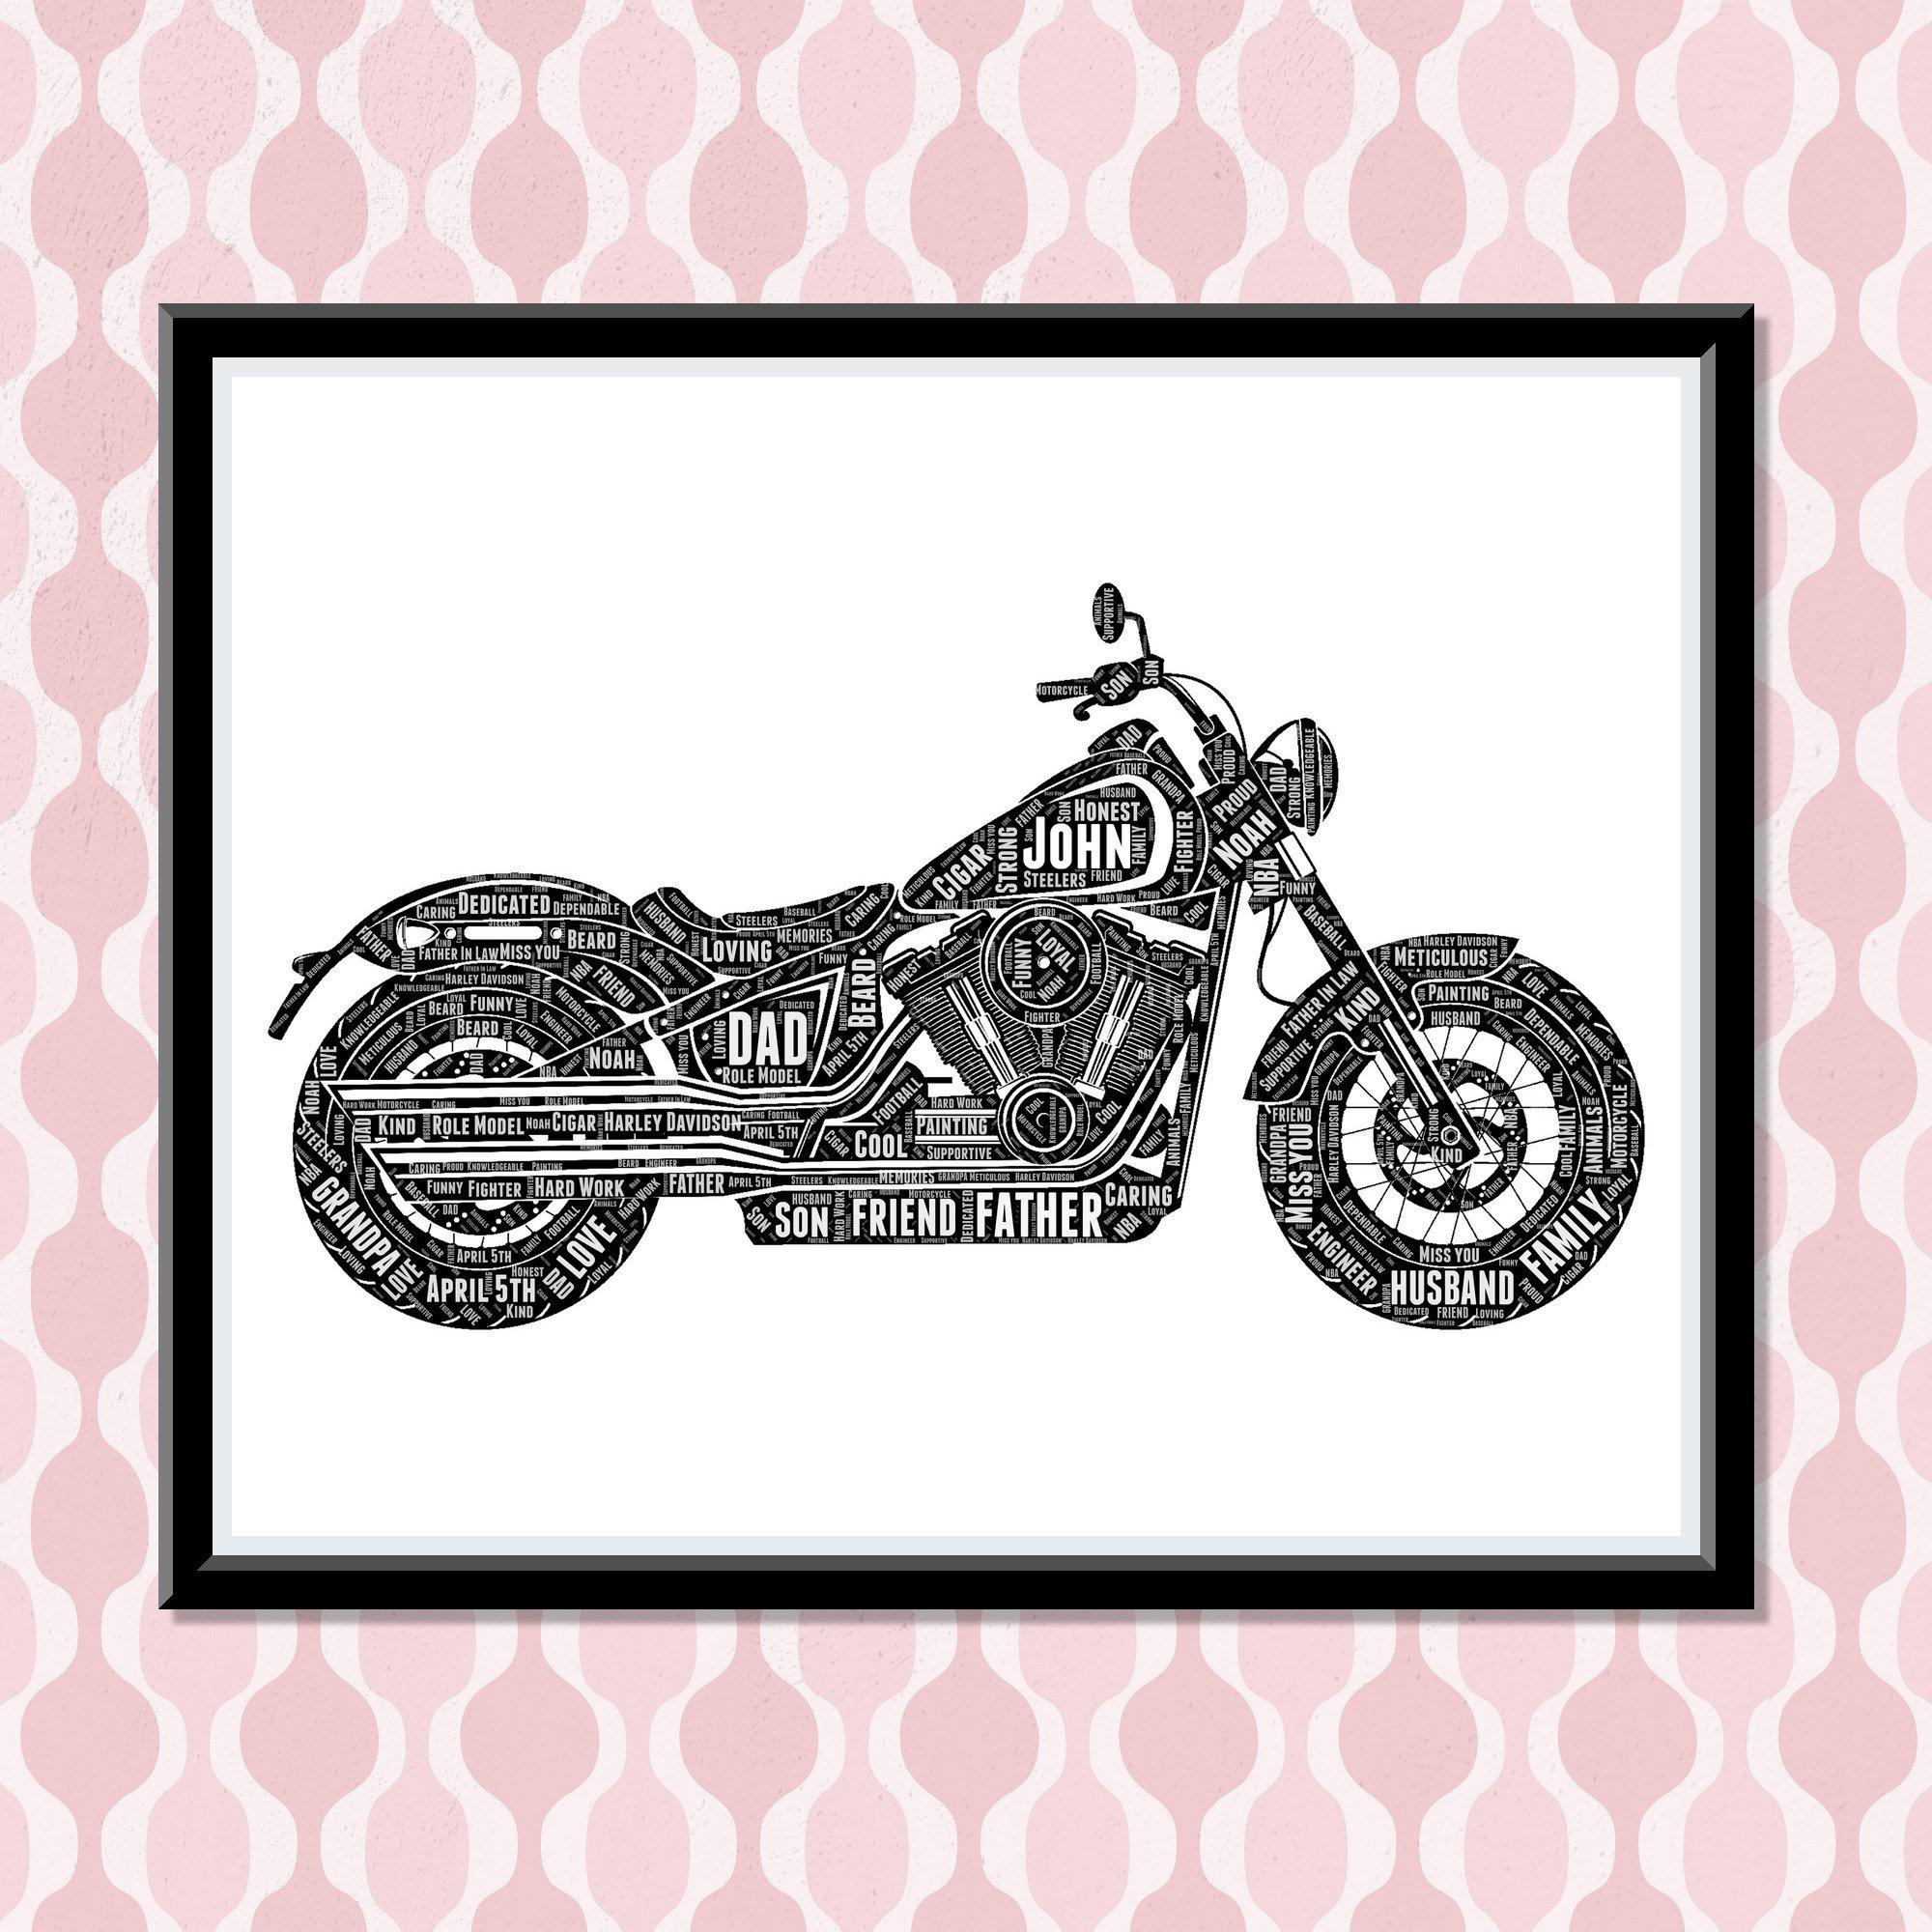 Harley Davidson Personalize Gift- Motorcycle Biker Wall Art Print- Dad Gifts For Him - Motorbike Rider Racer Honda Yamaha Club Ride Wordle